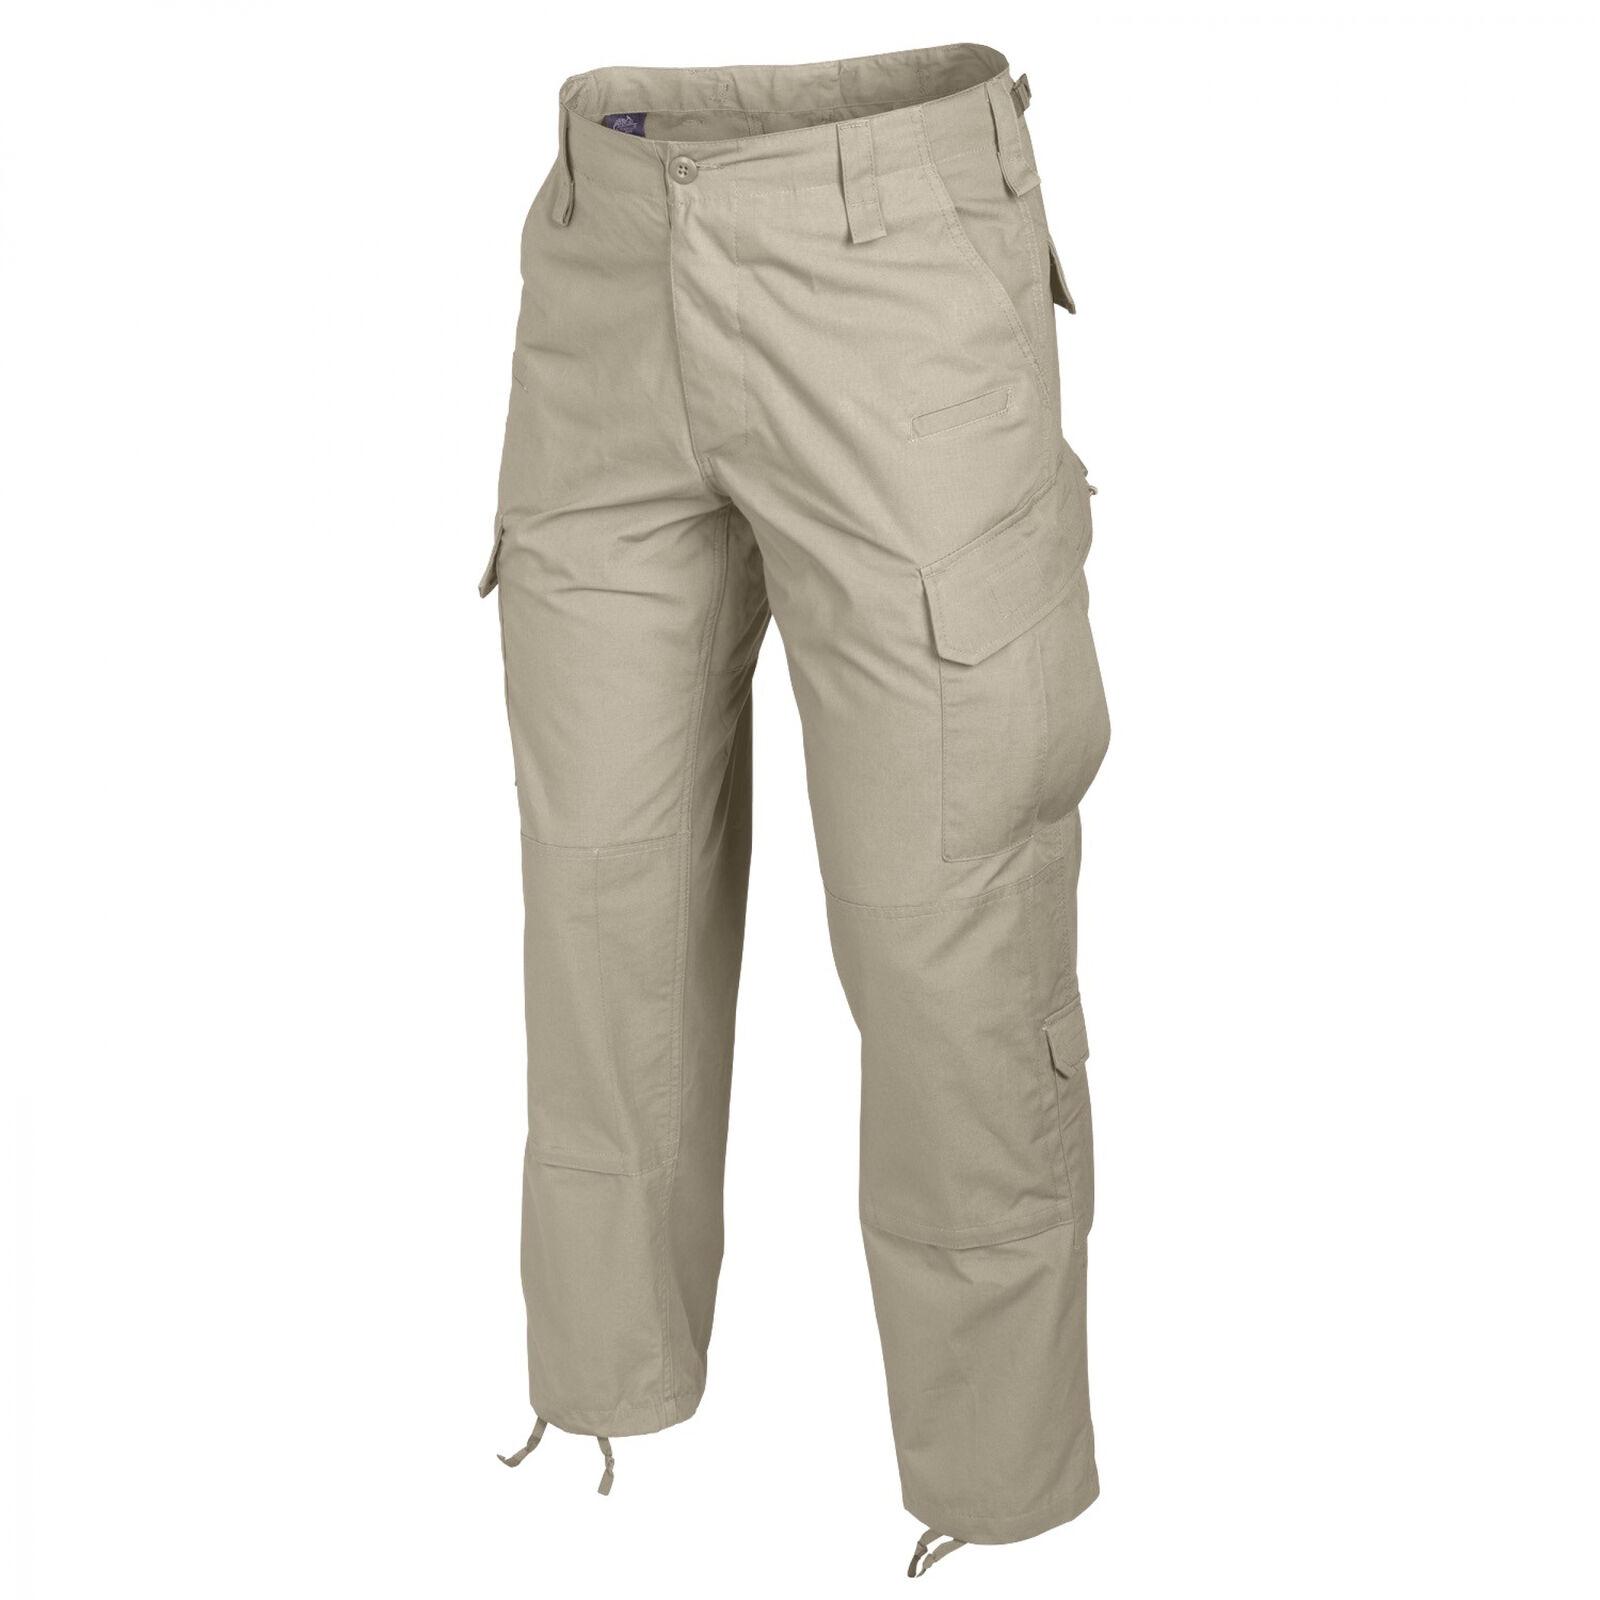 Helikon-Tex Hose Combat Patrol Uniform Cotton Ripstop - KHAKI